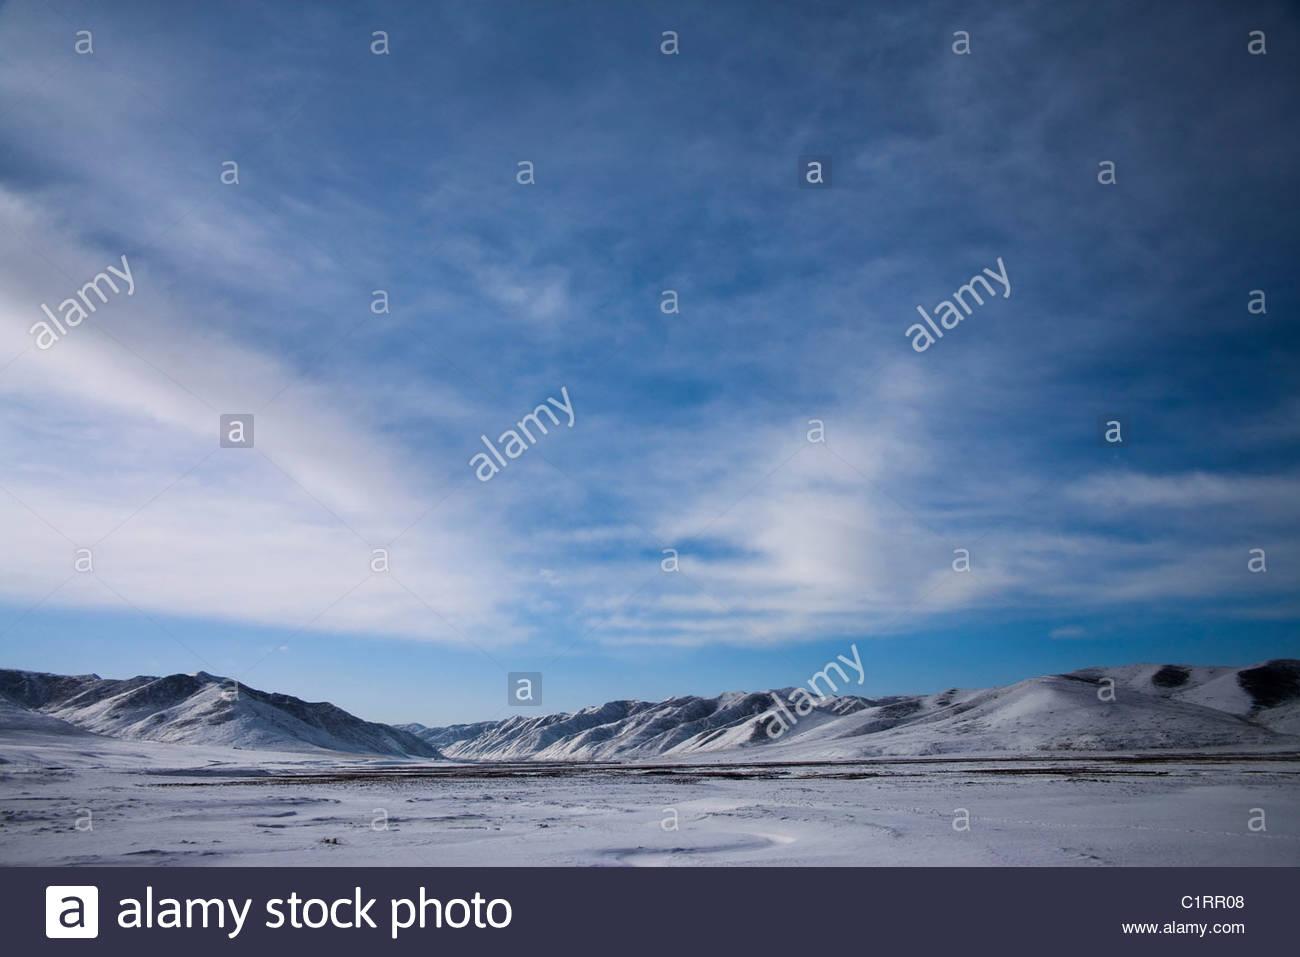 Luqu, Gannan Tibetan Autonomous Prefecture, Gansu Province, China - Stock Image